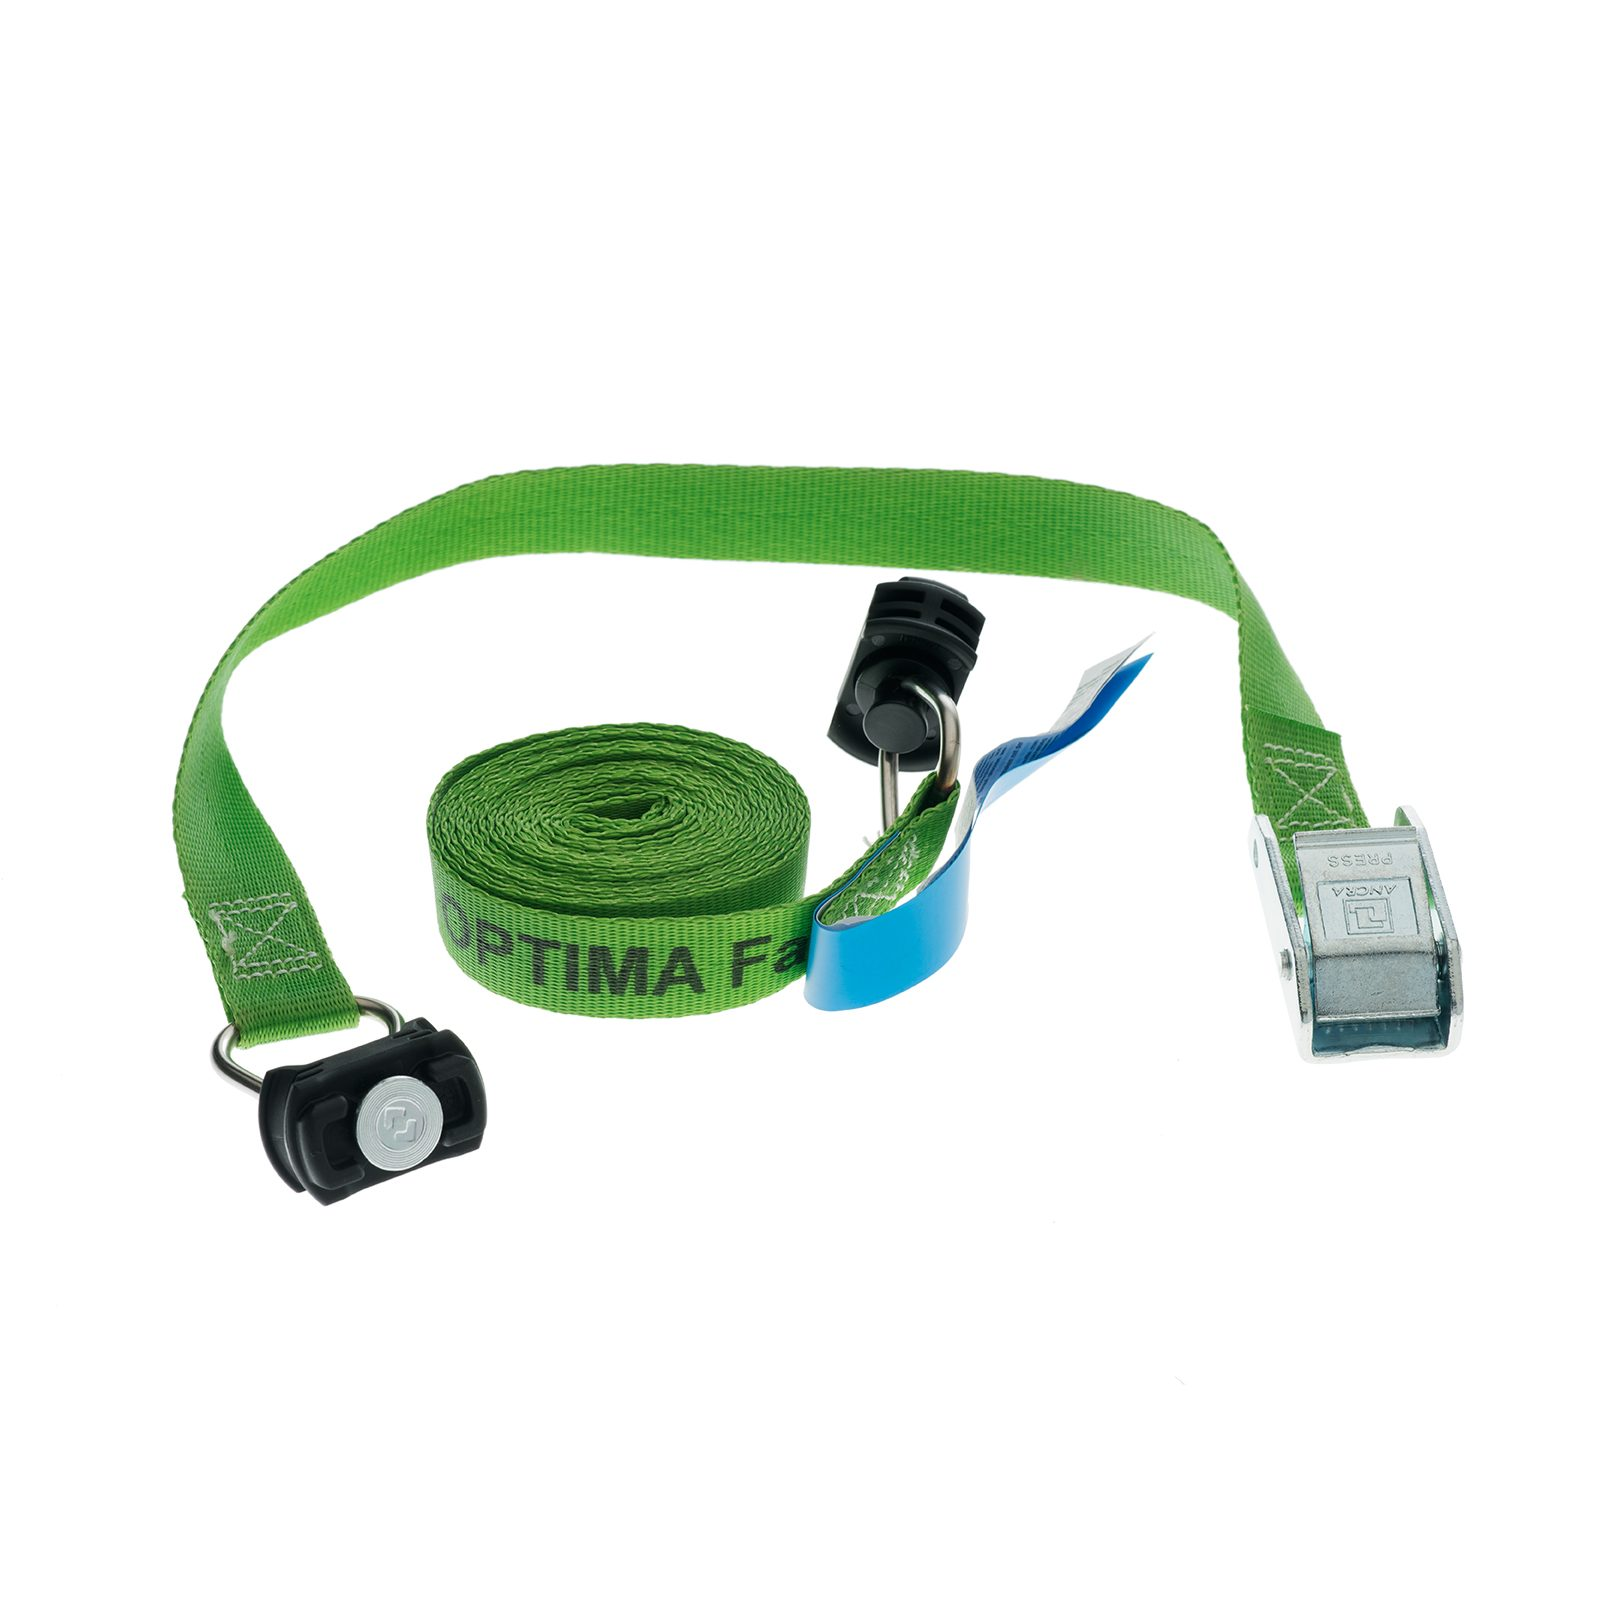 /tmp/con-5d56a4c1073b3/283_Product.jpg